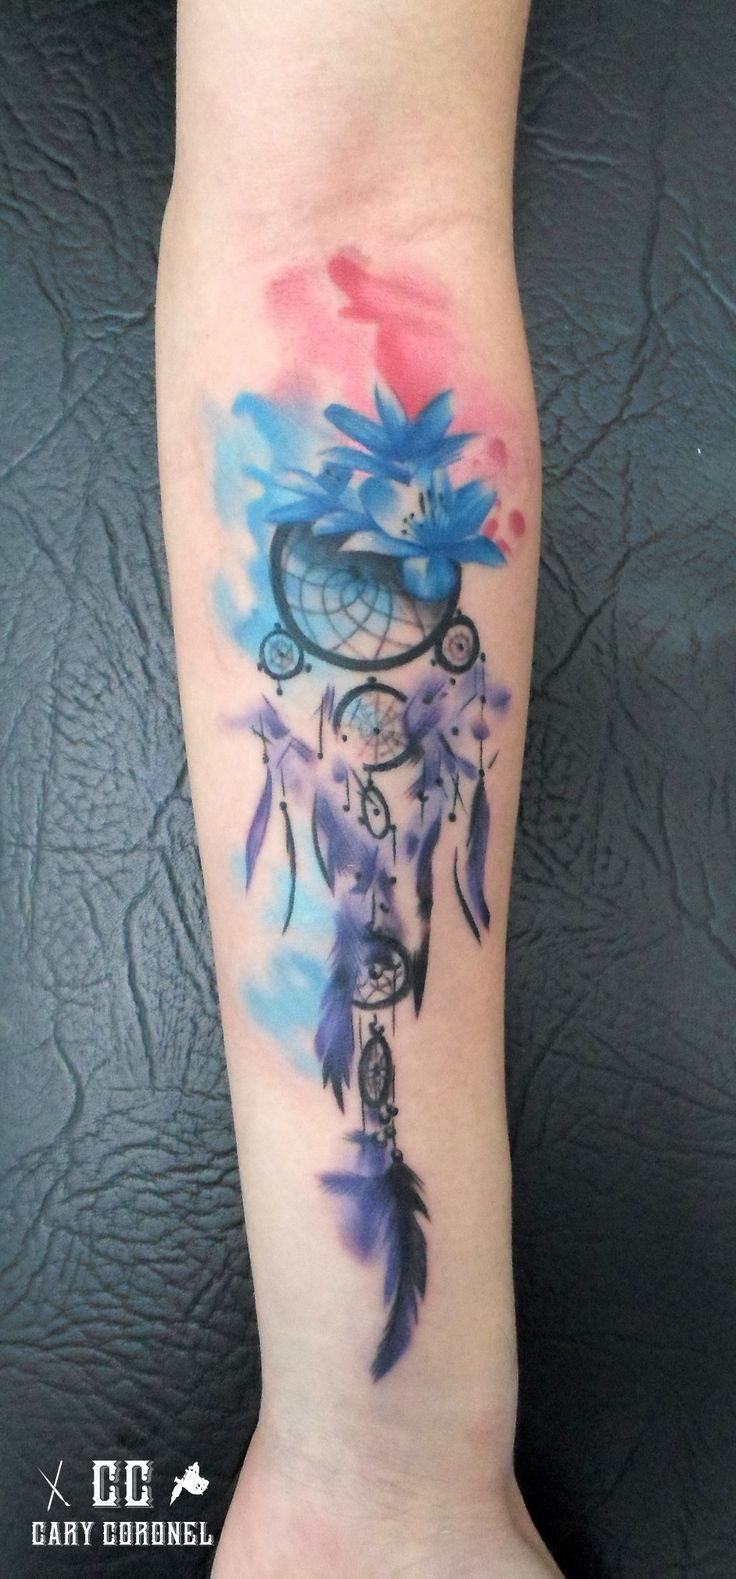 25 best ideas about dreamcatcher tattoos on pinterest. Black Bedroom Furniture Sets. Home Design Ideas